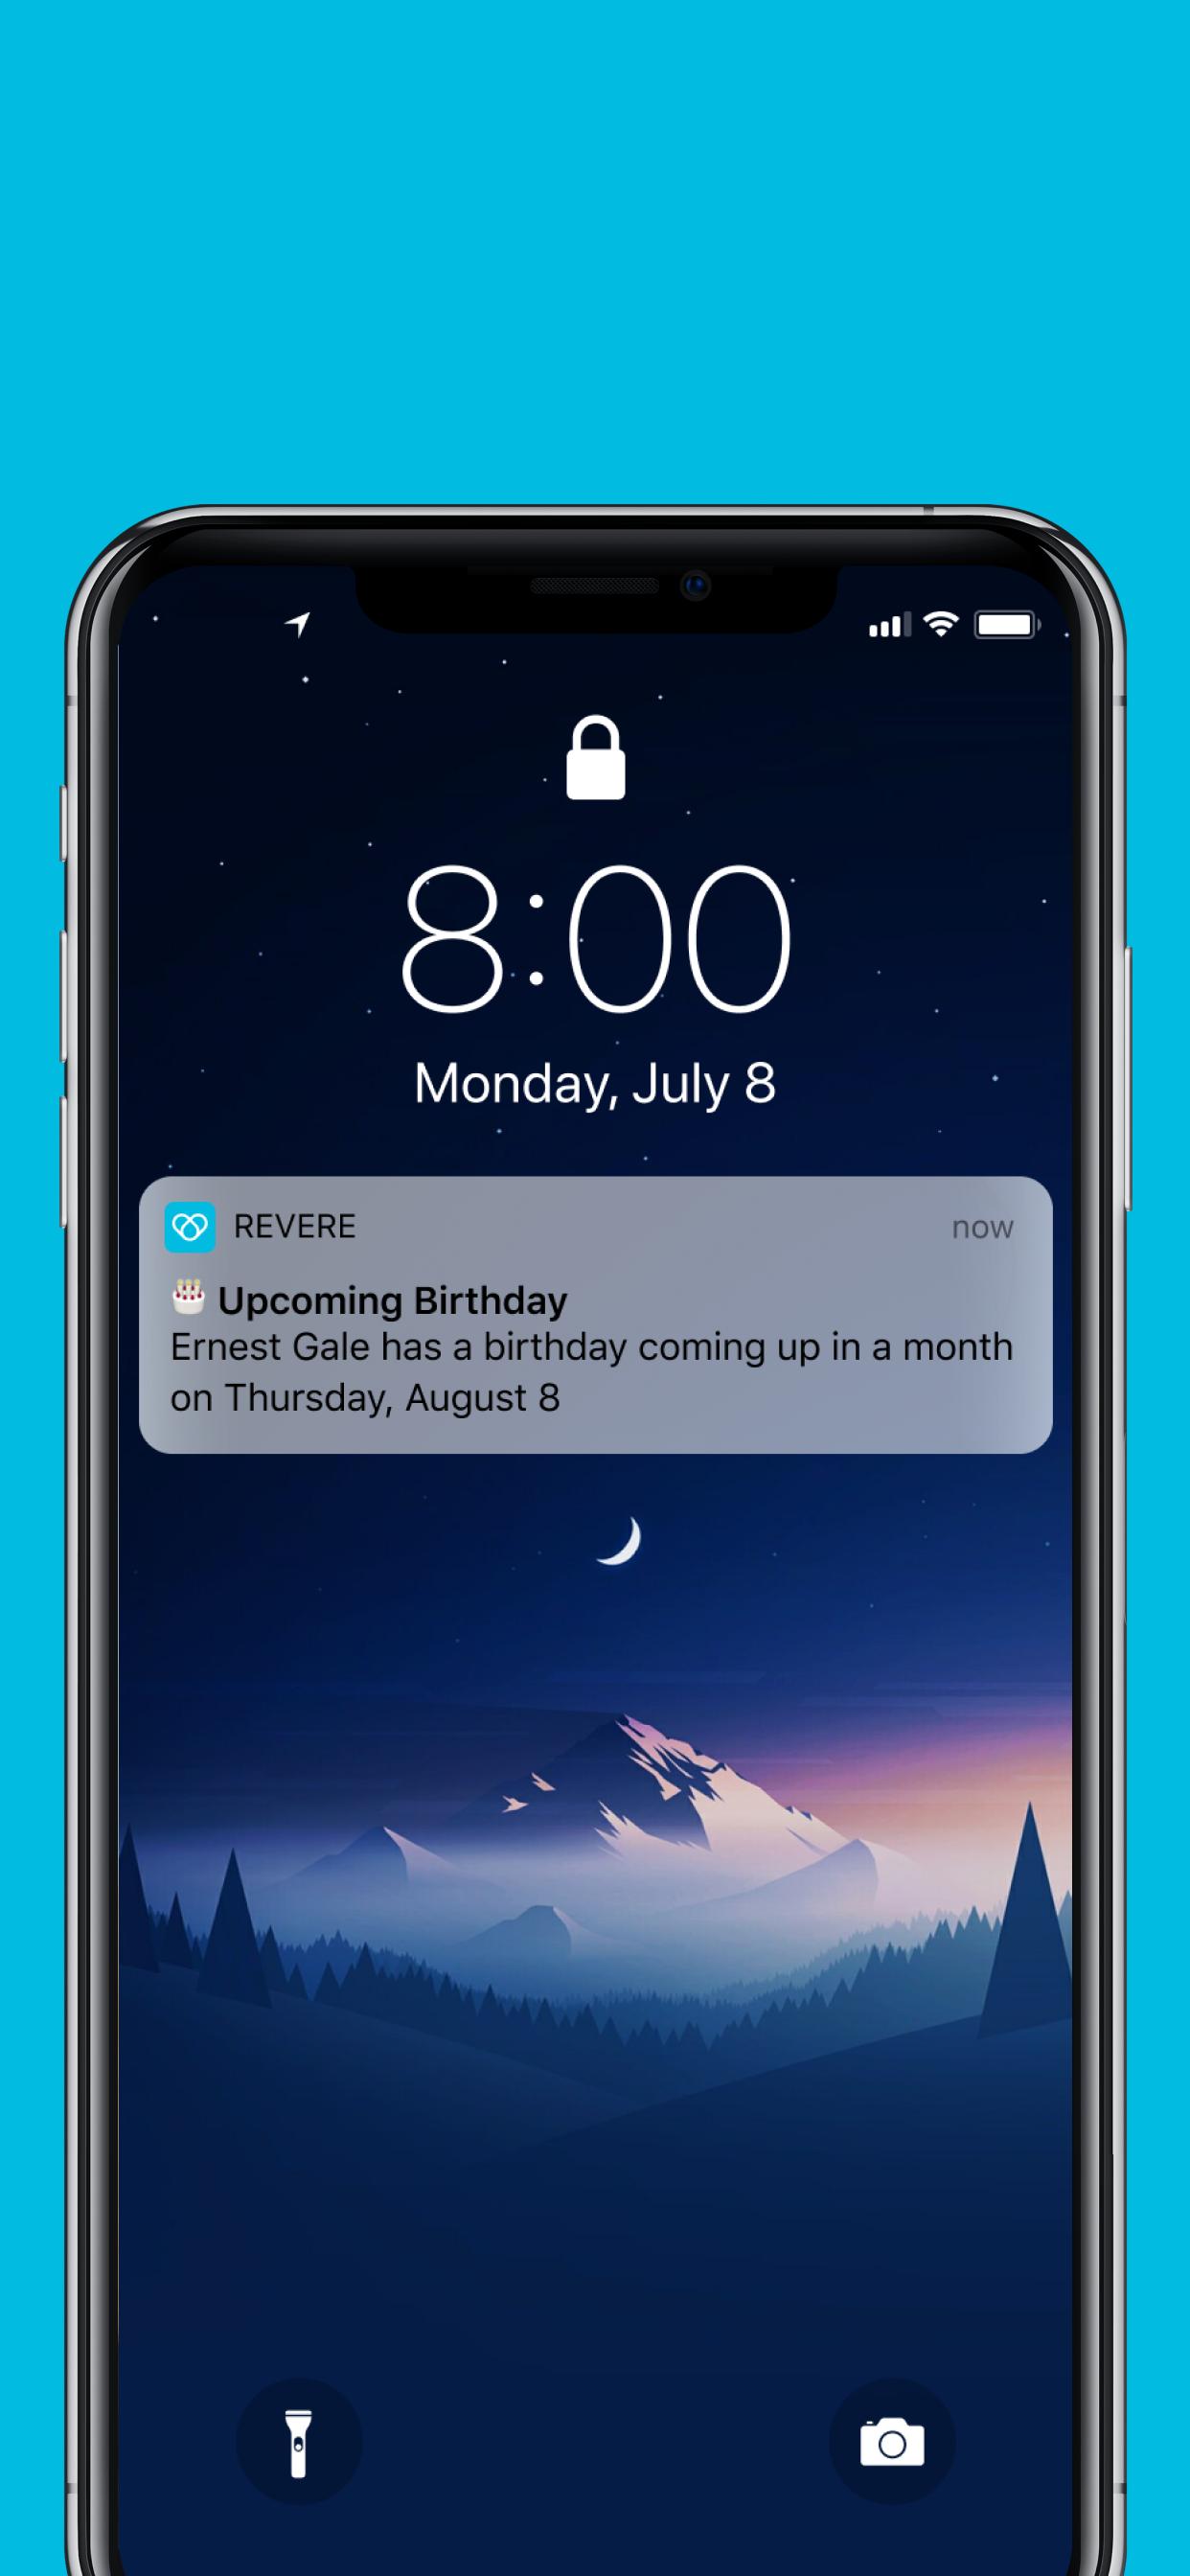 iPhone XS Max-Birthday reminders-BlueBG.png